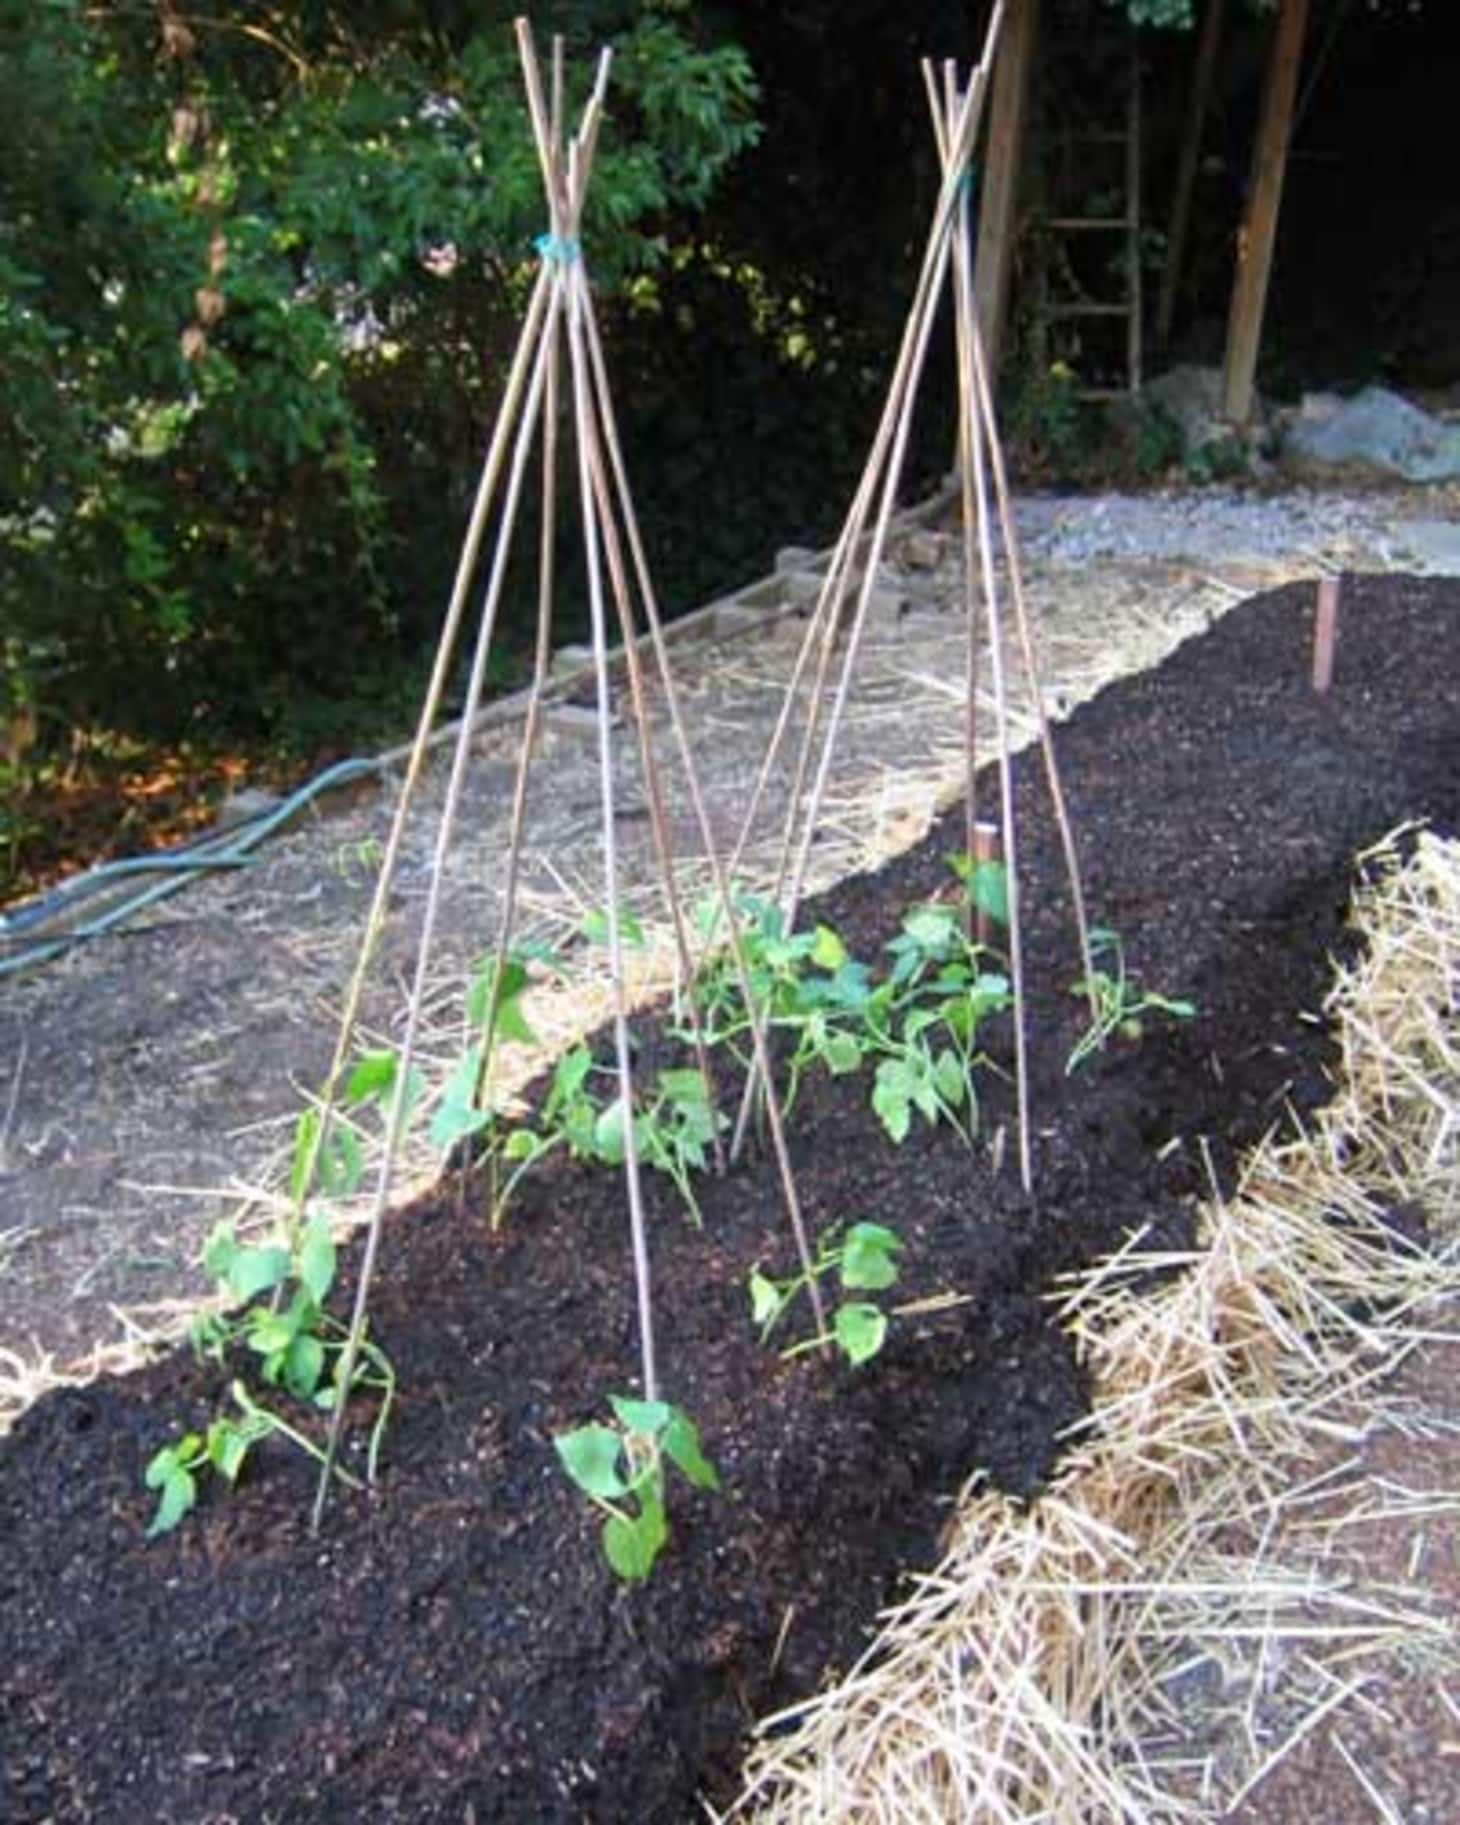 How To Start a NoDig Garden … Step by Step Dig gardens